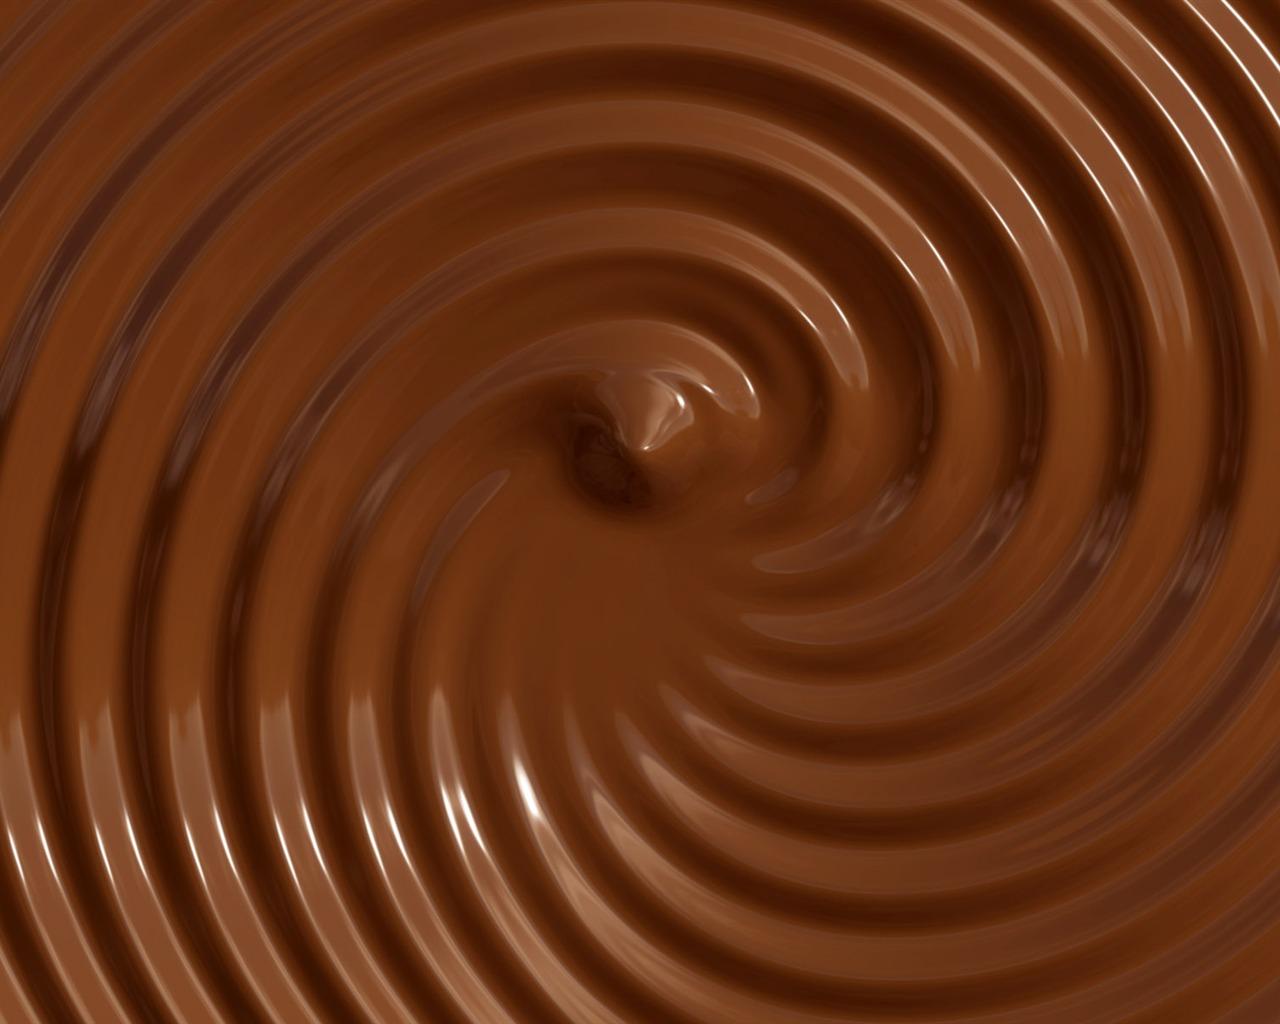 Fondos De Pantalla De Chocolates: Chocolate Plano De Fondo (2) #6